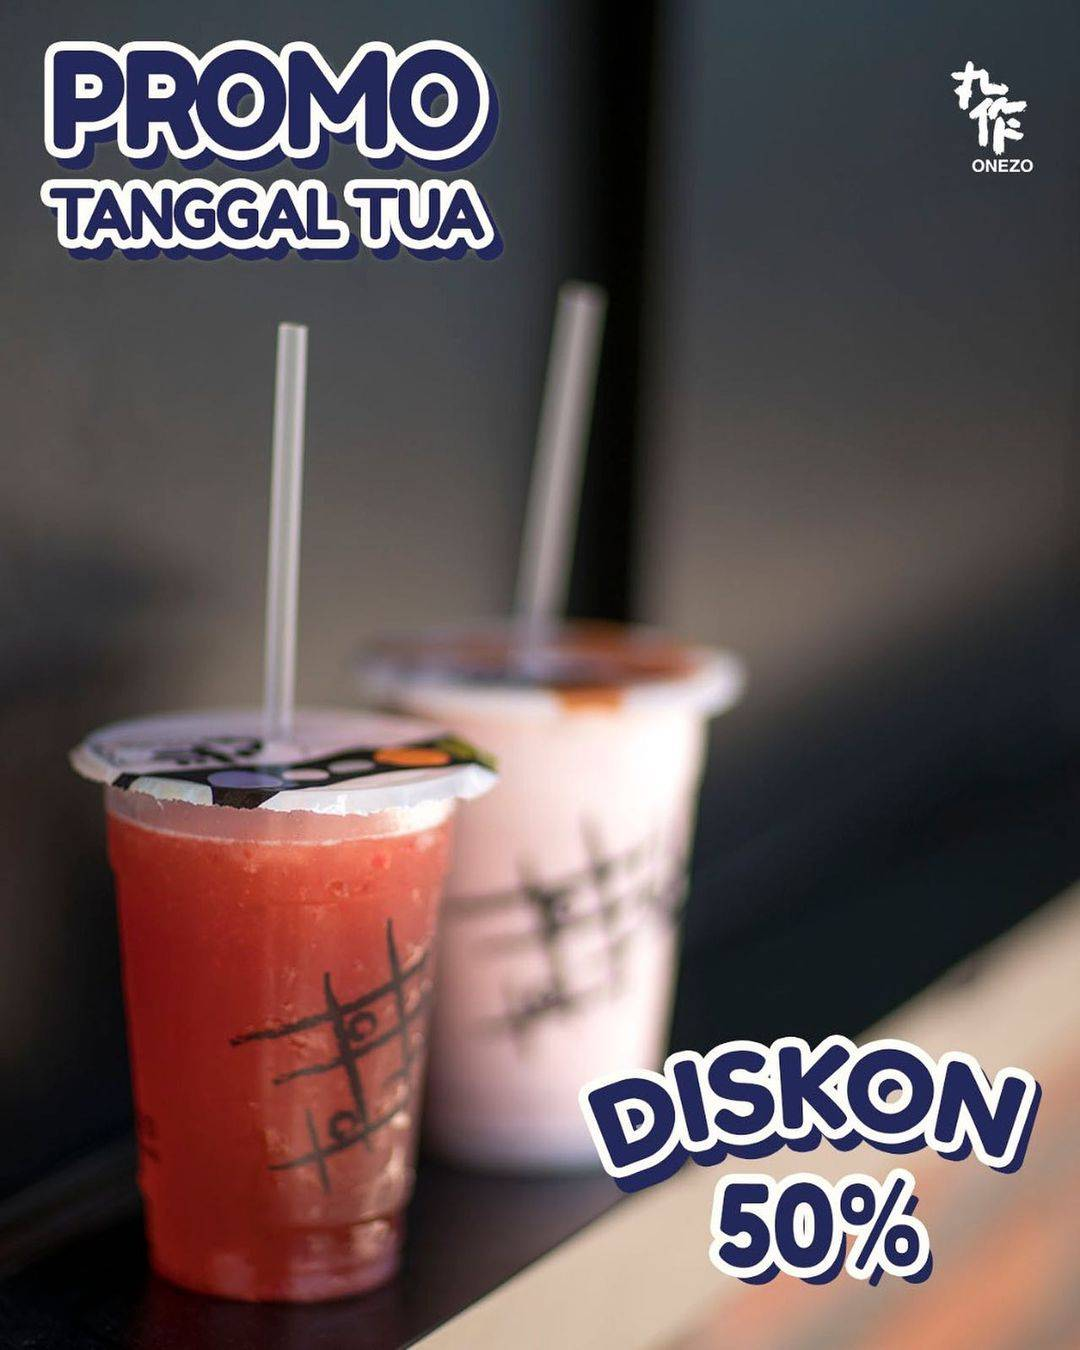 Diskon Onezo Promo Tanggal Tua Diskon 50%